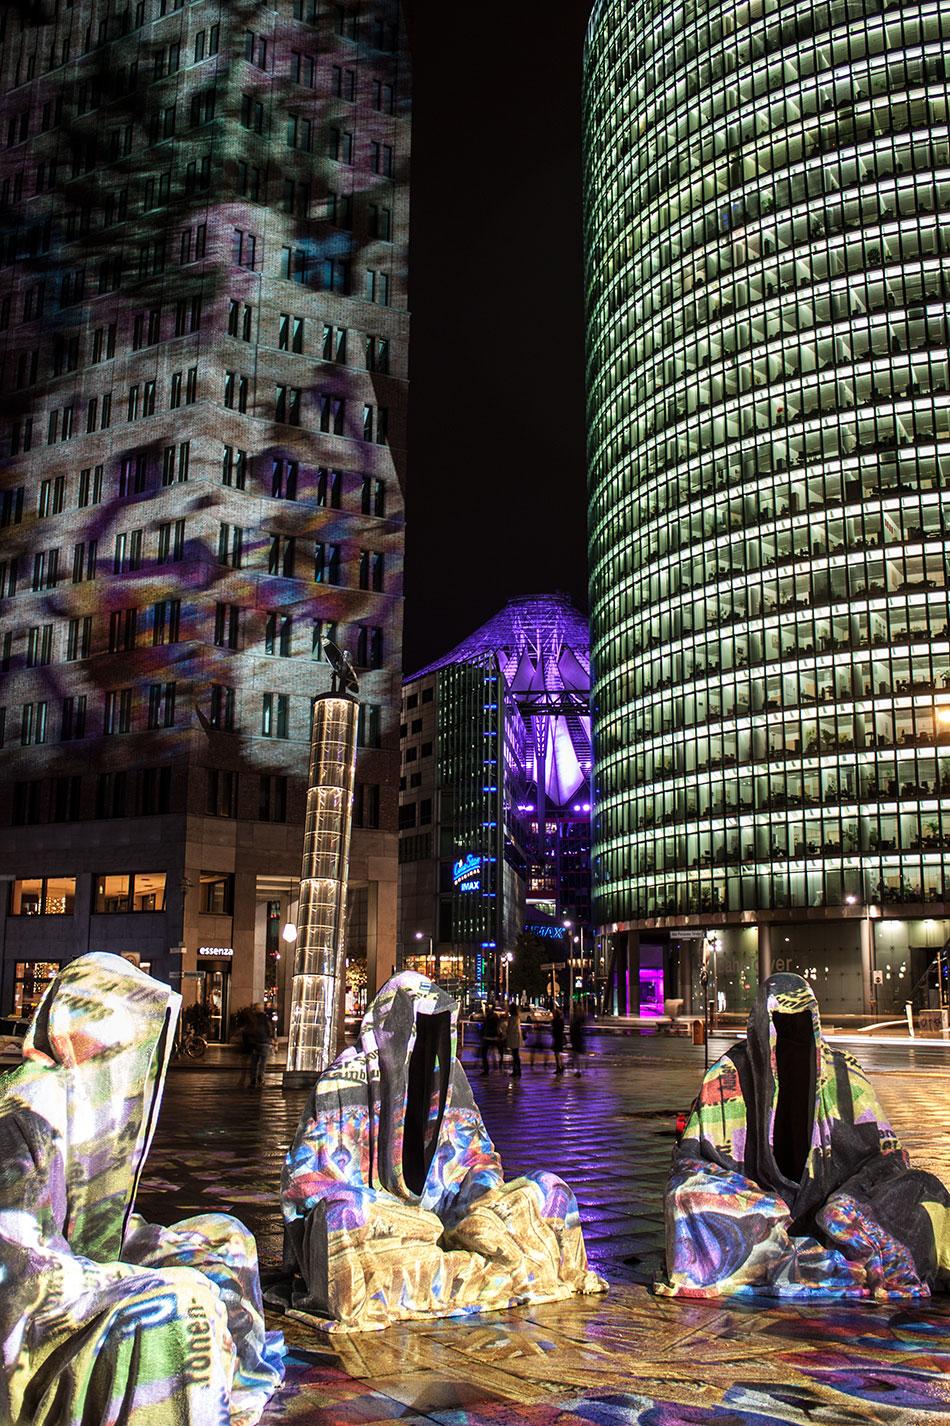 festival-of-lights-berlin-light-art-festival-contemporary-fine-art-design-show-guardiansof-time-manfred-kili-kielnhofer-sculpture-3843